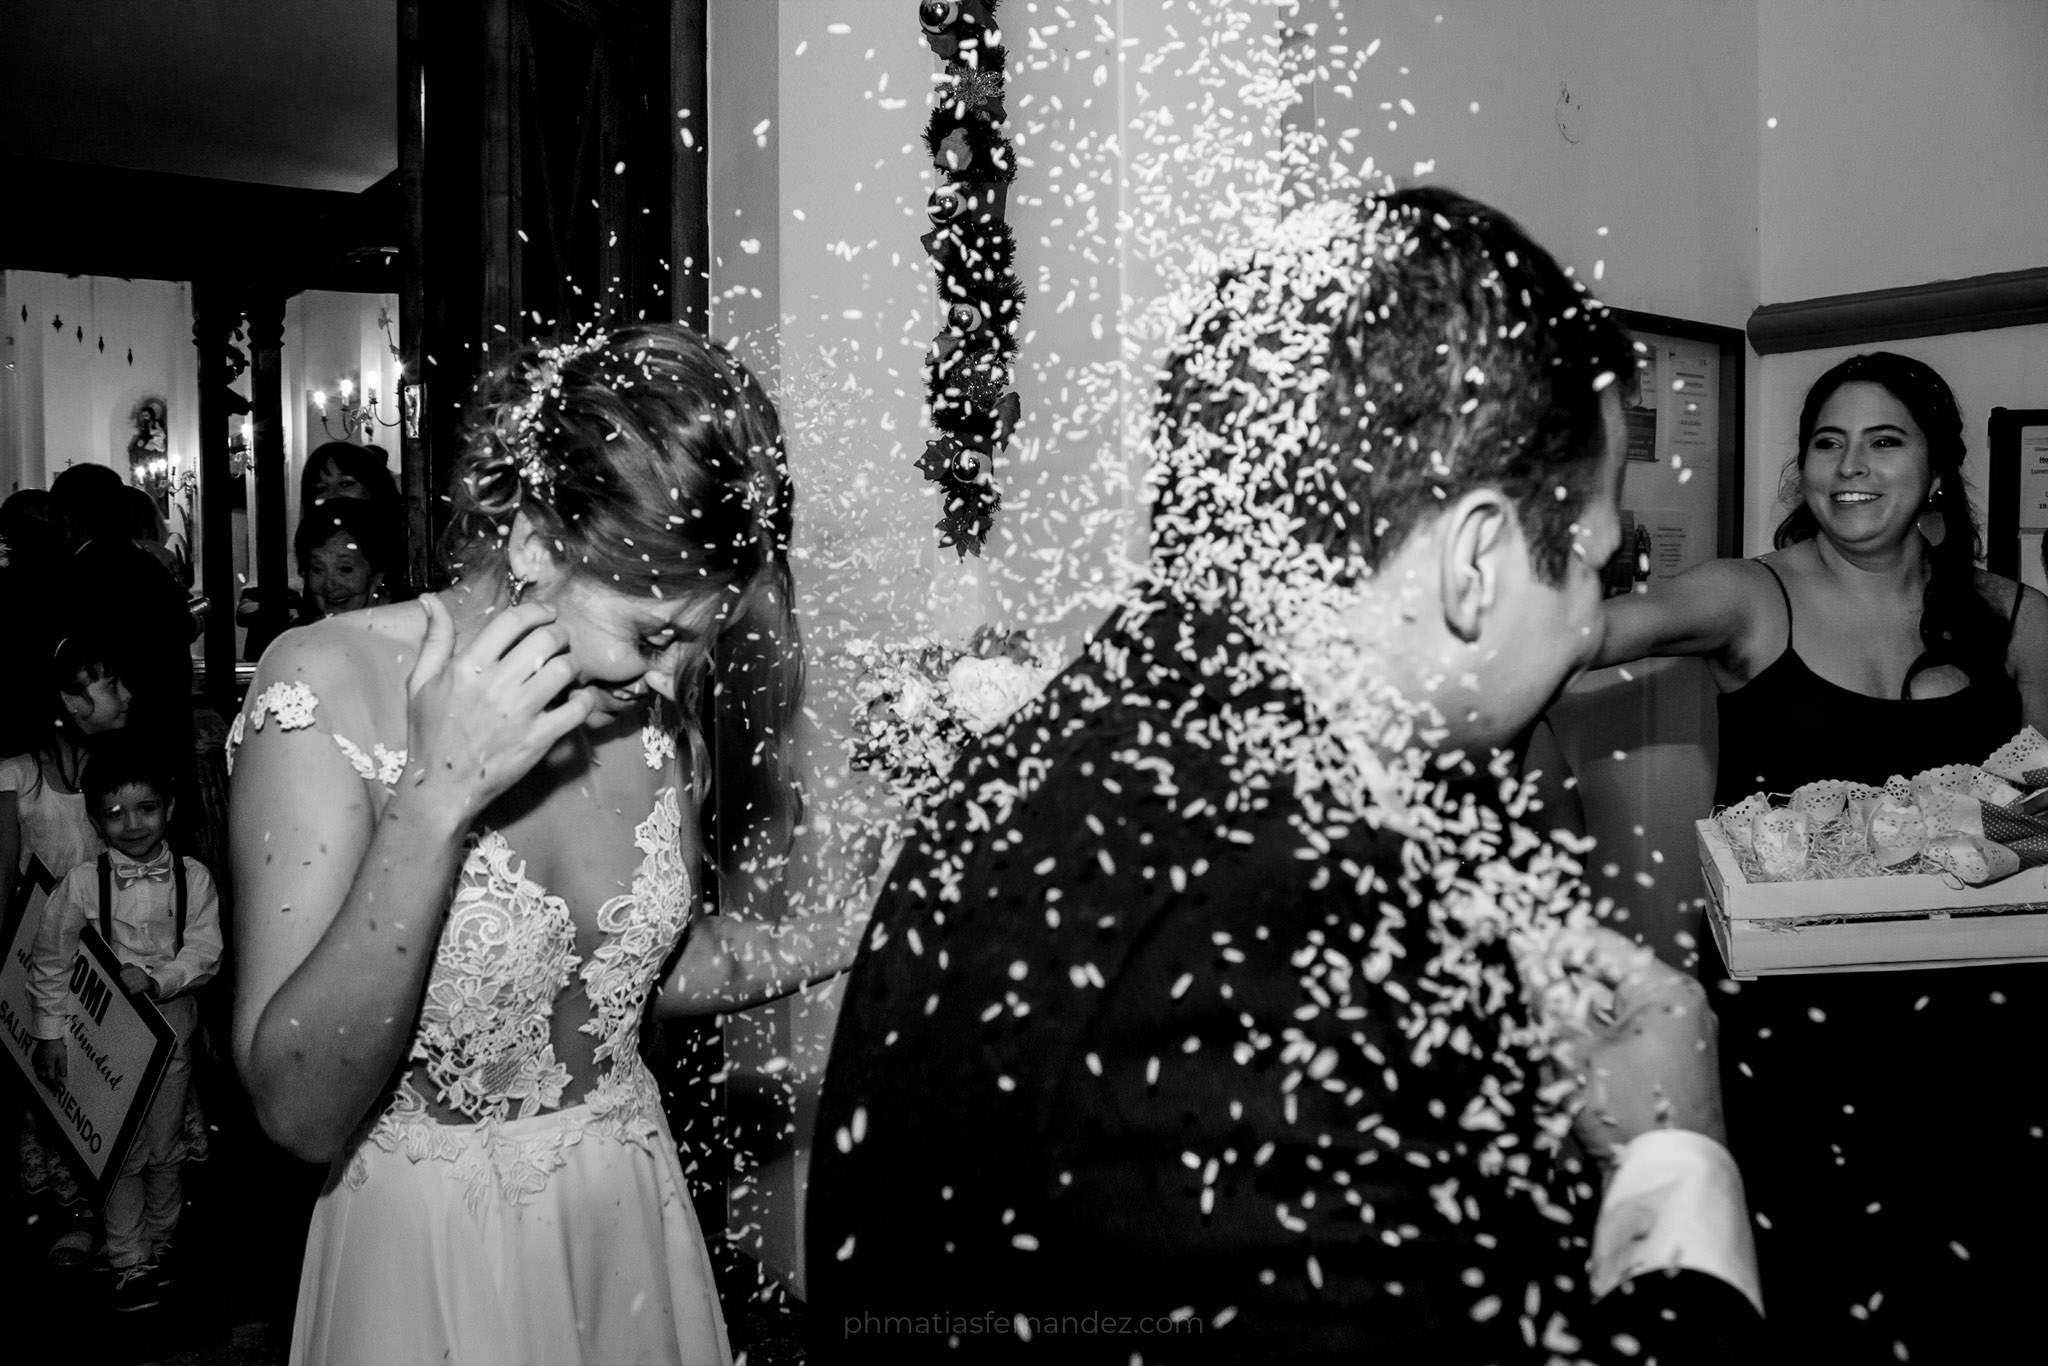 Boda Carli & Tomi - phmatiasfernandez - matias fernandez - matias fernandez fotografo de bodas